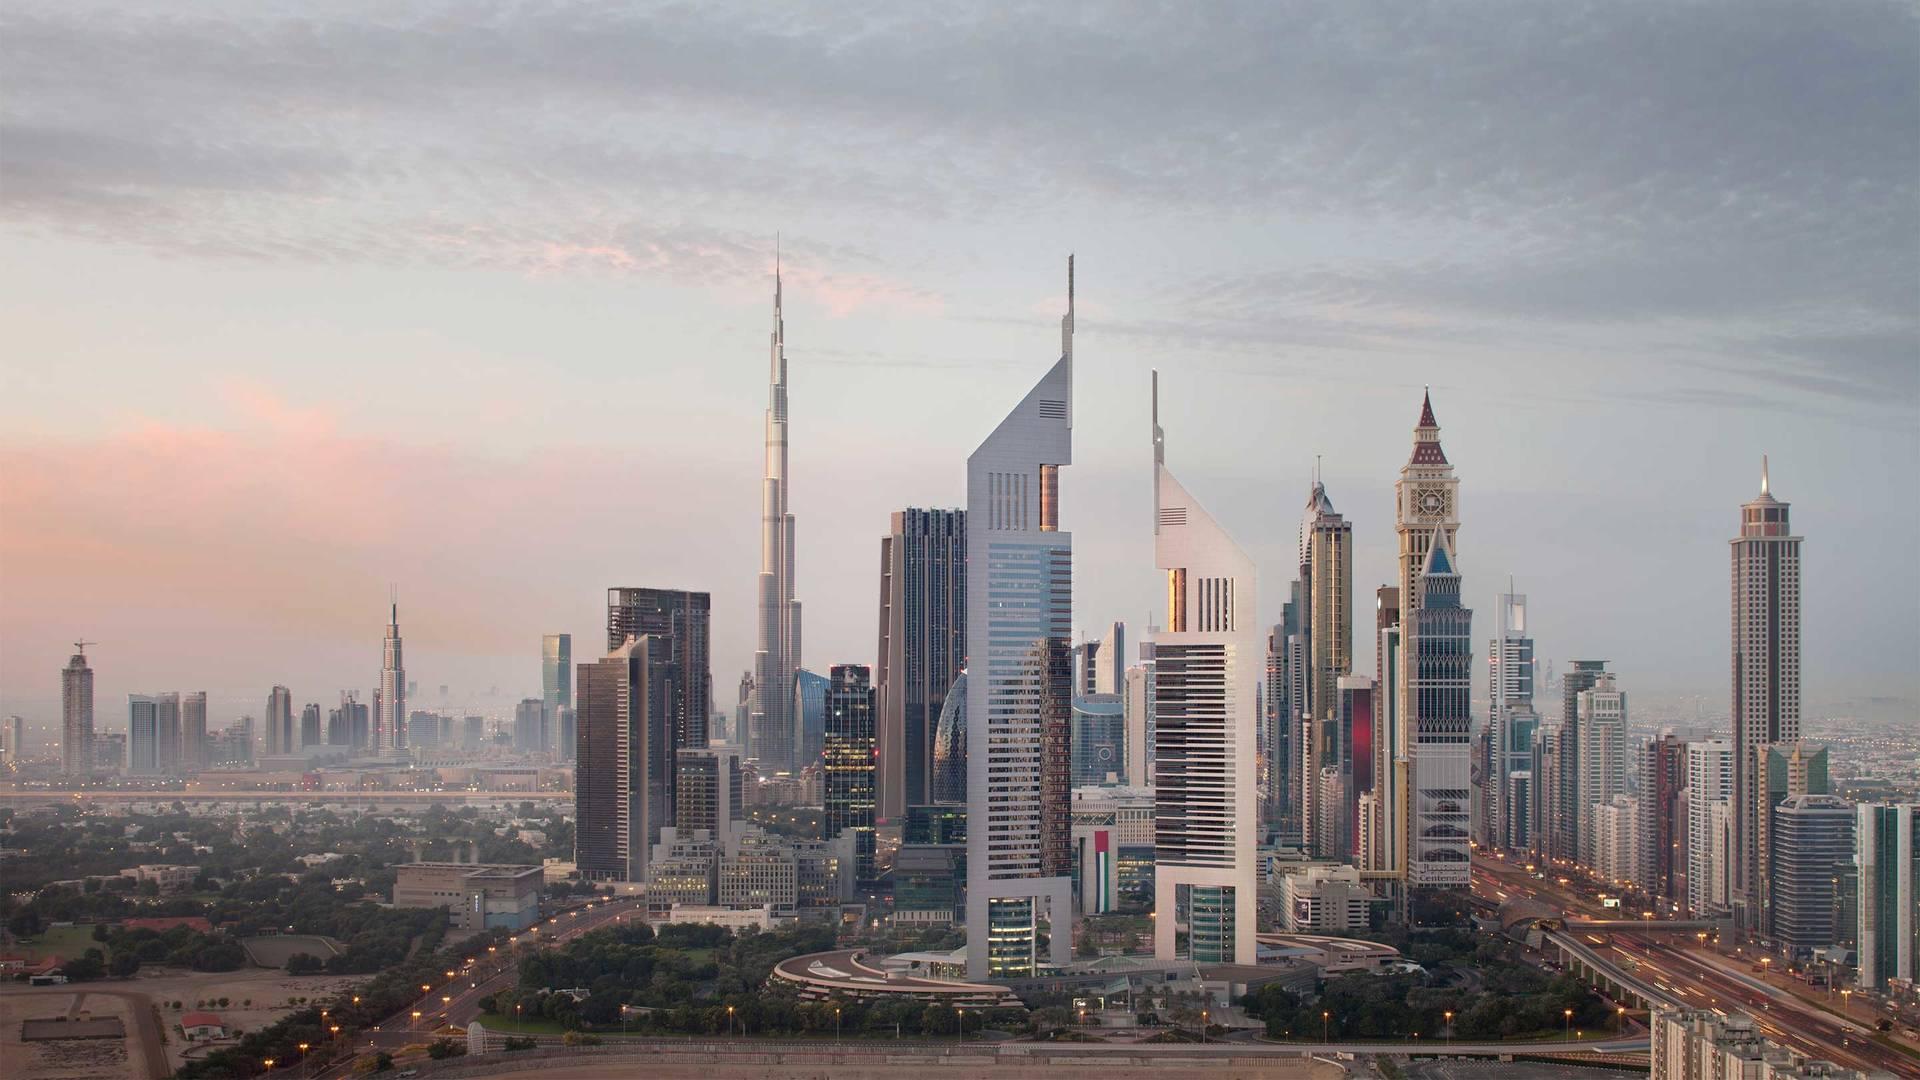 16-9_Jumeirah Emirates Towers — архитектурный облик 4